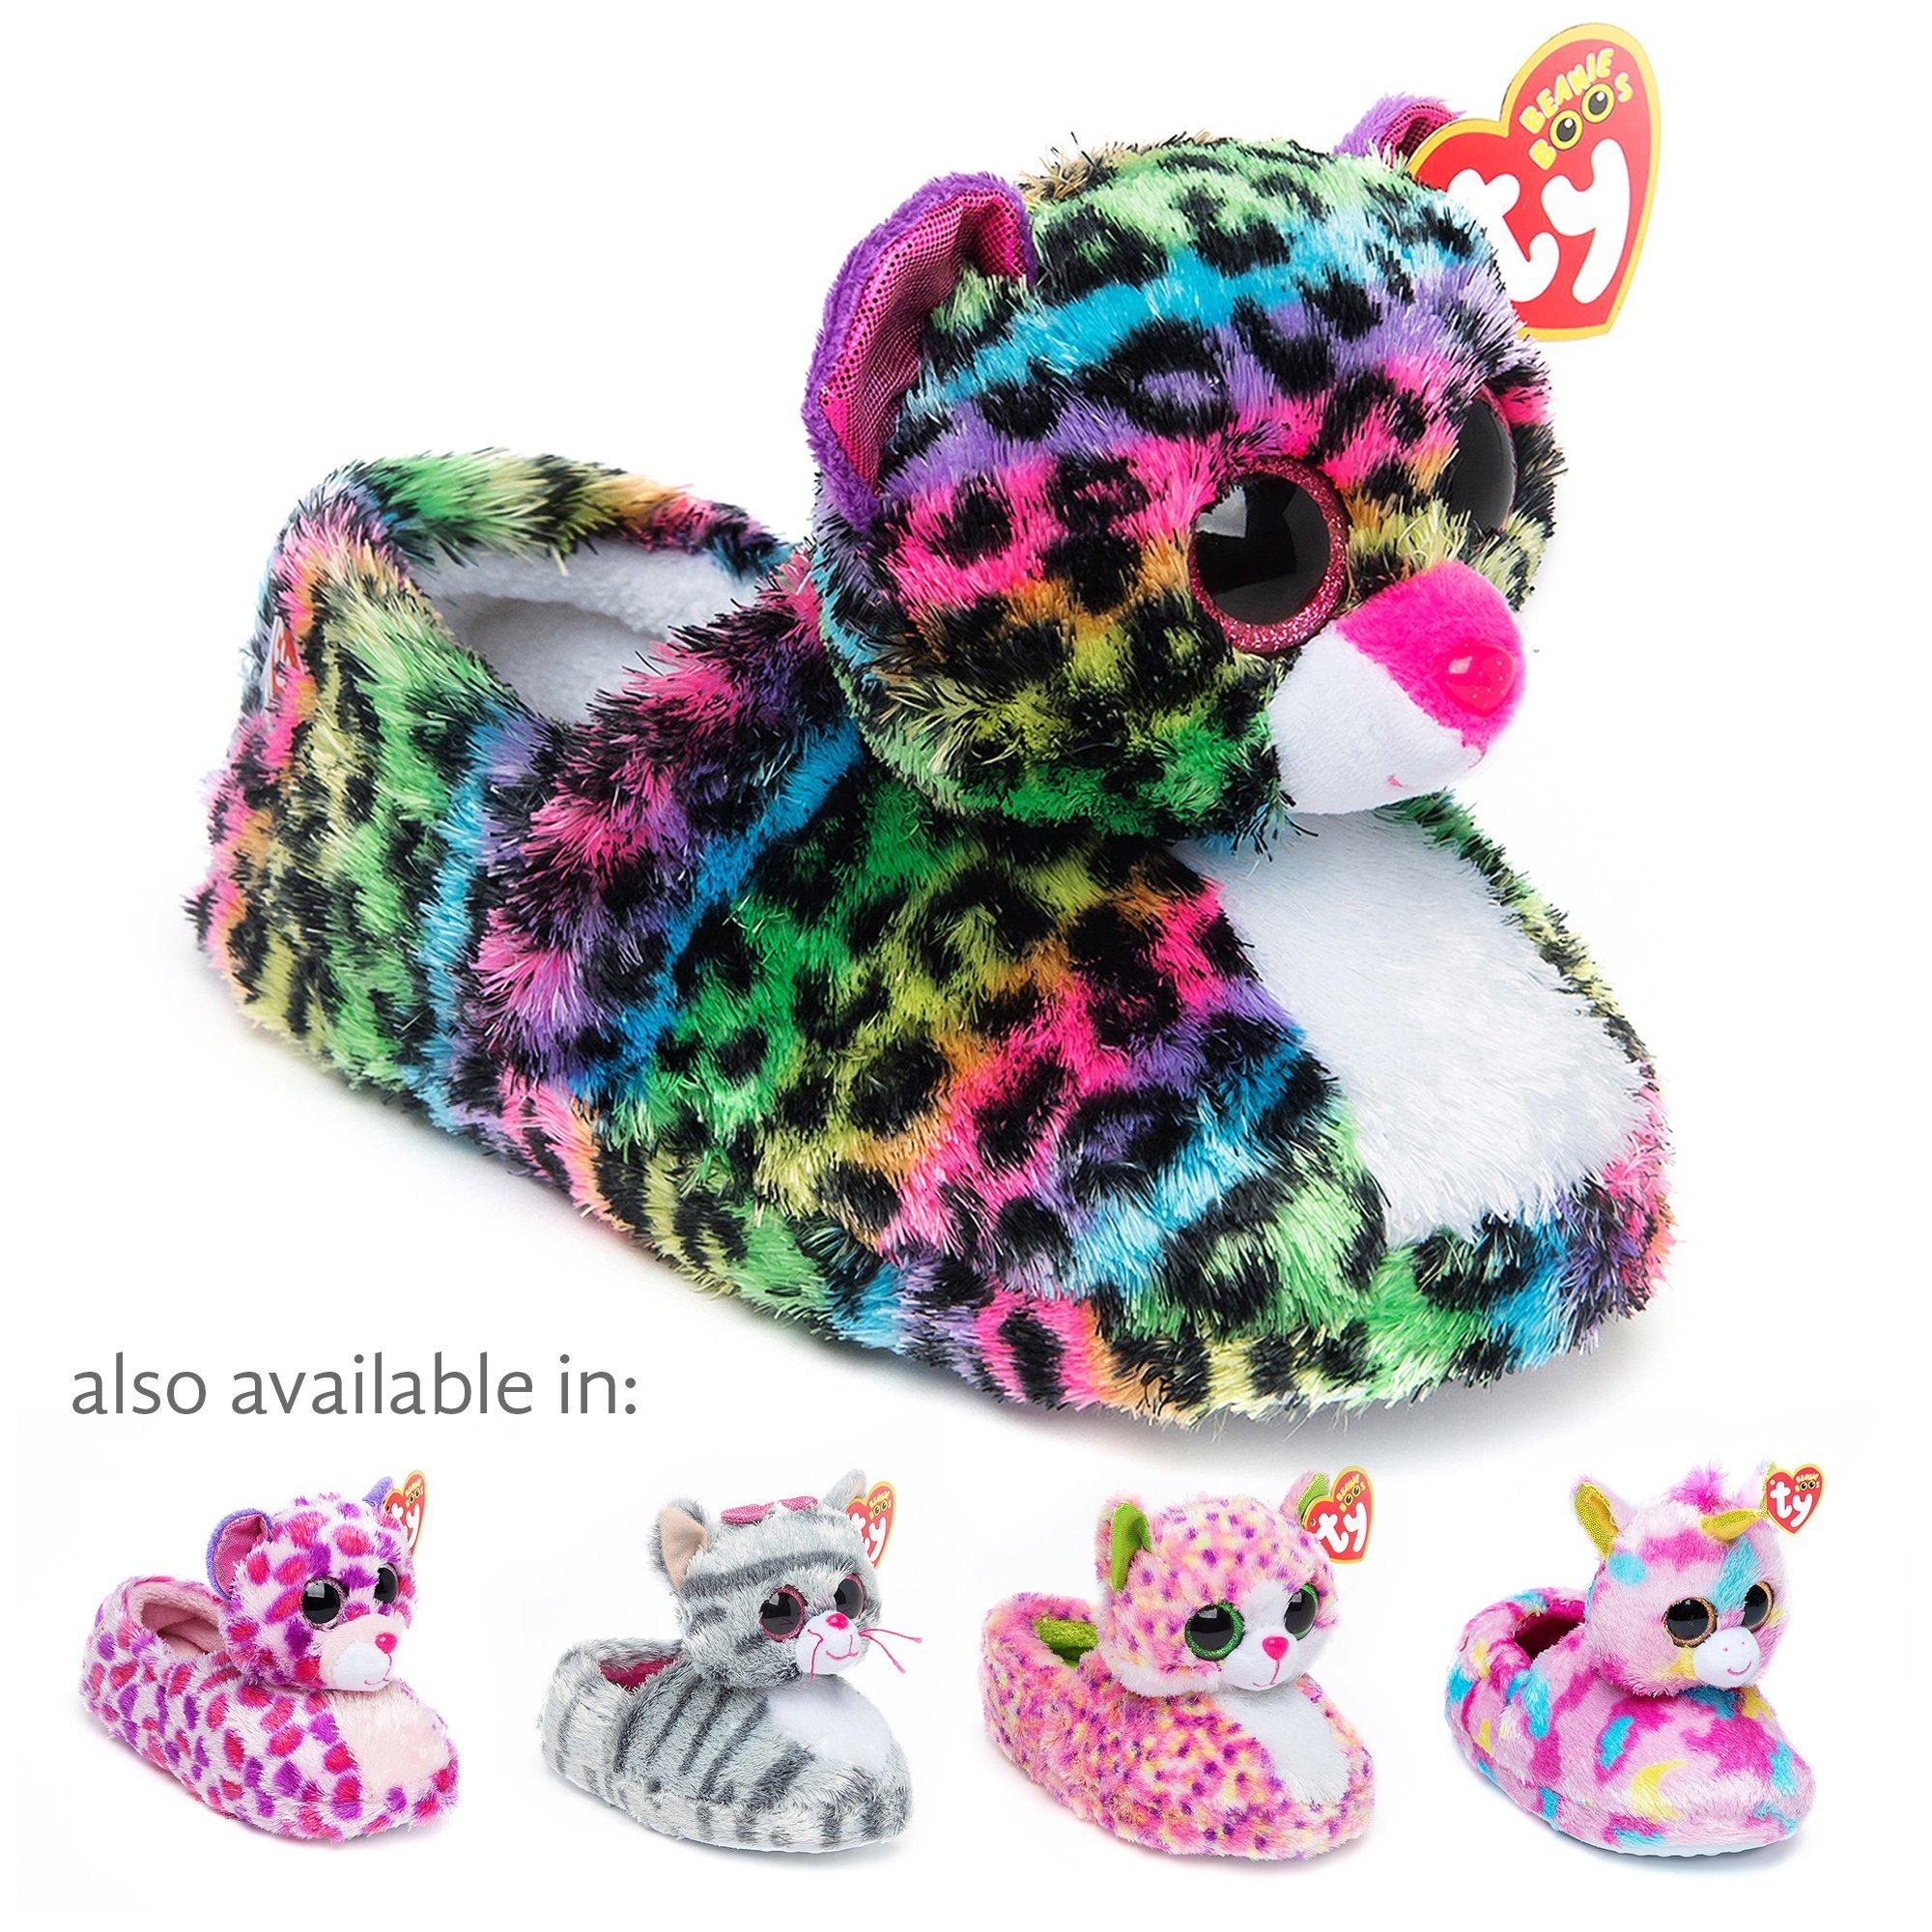 TY Beanie Boos Kids Girls Big Head Dotty Leopard Non Skid Plush Slippers, Green/White, Small